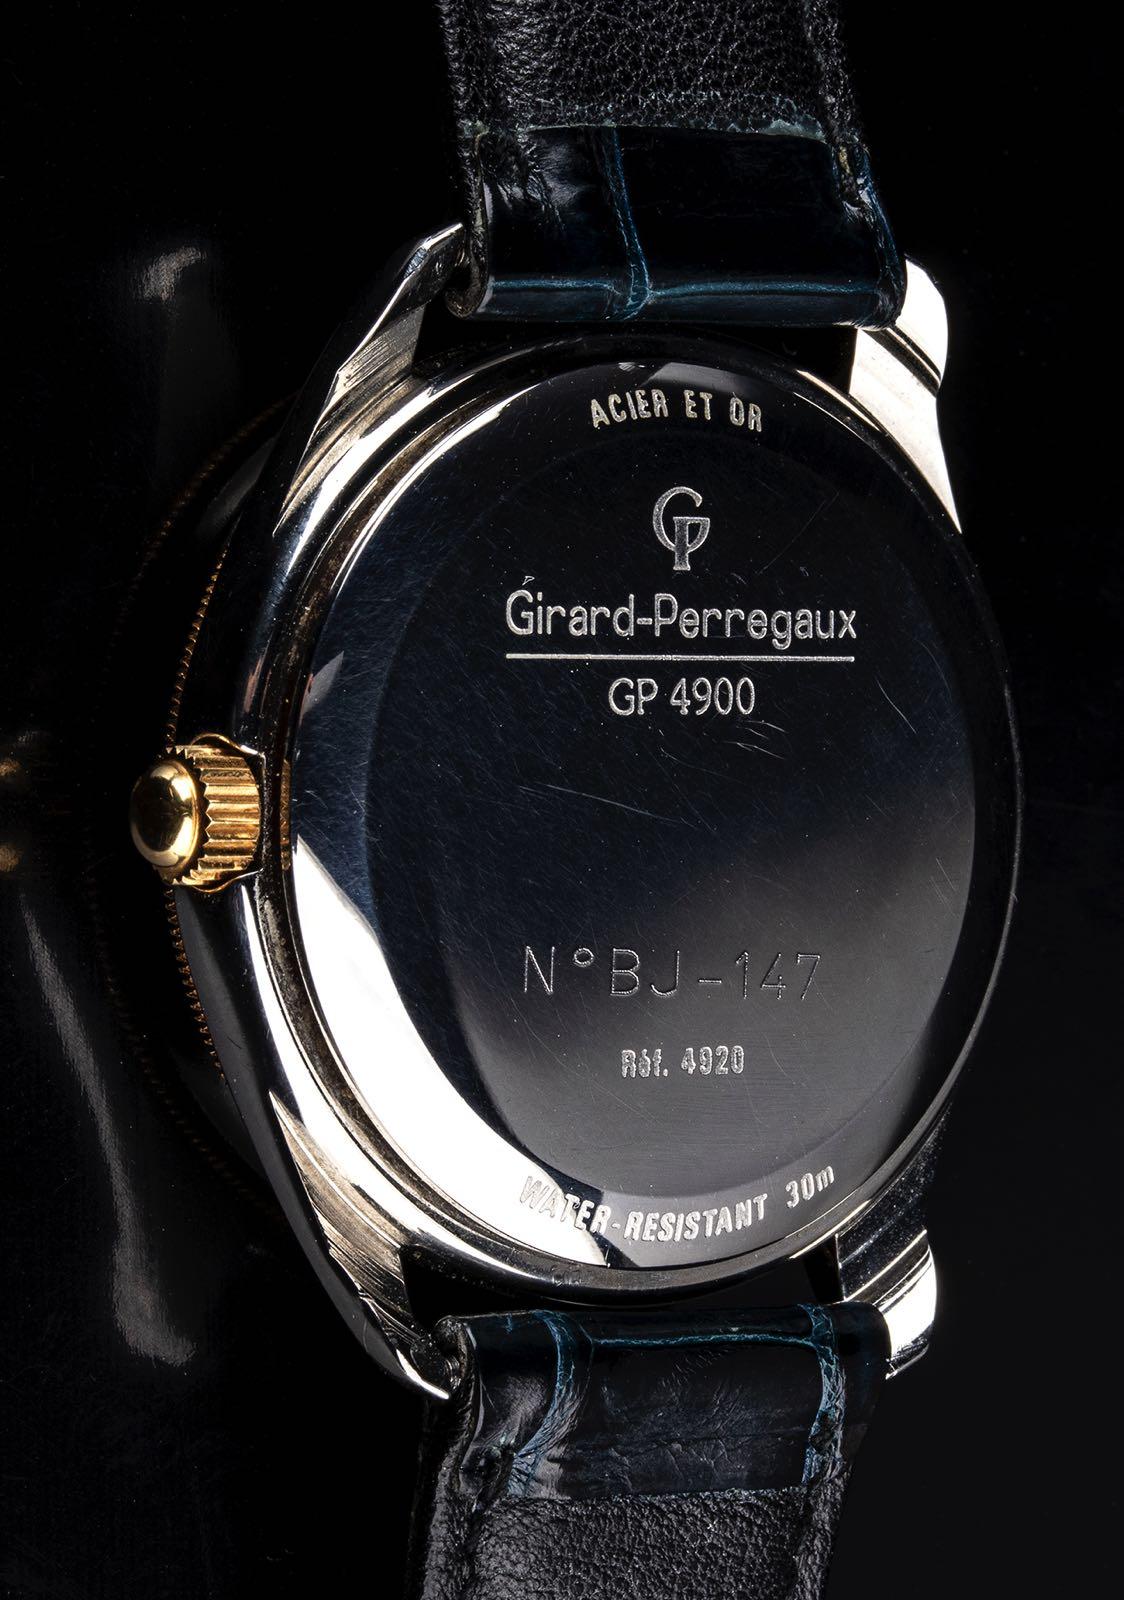 Girrard Perregaux, Power Reserve ref 4900, 90', N.O.S. - Image 3 of 4